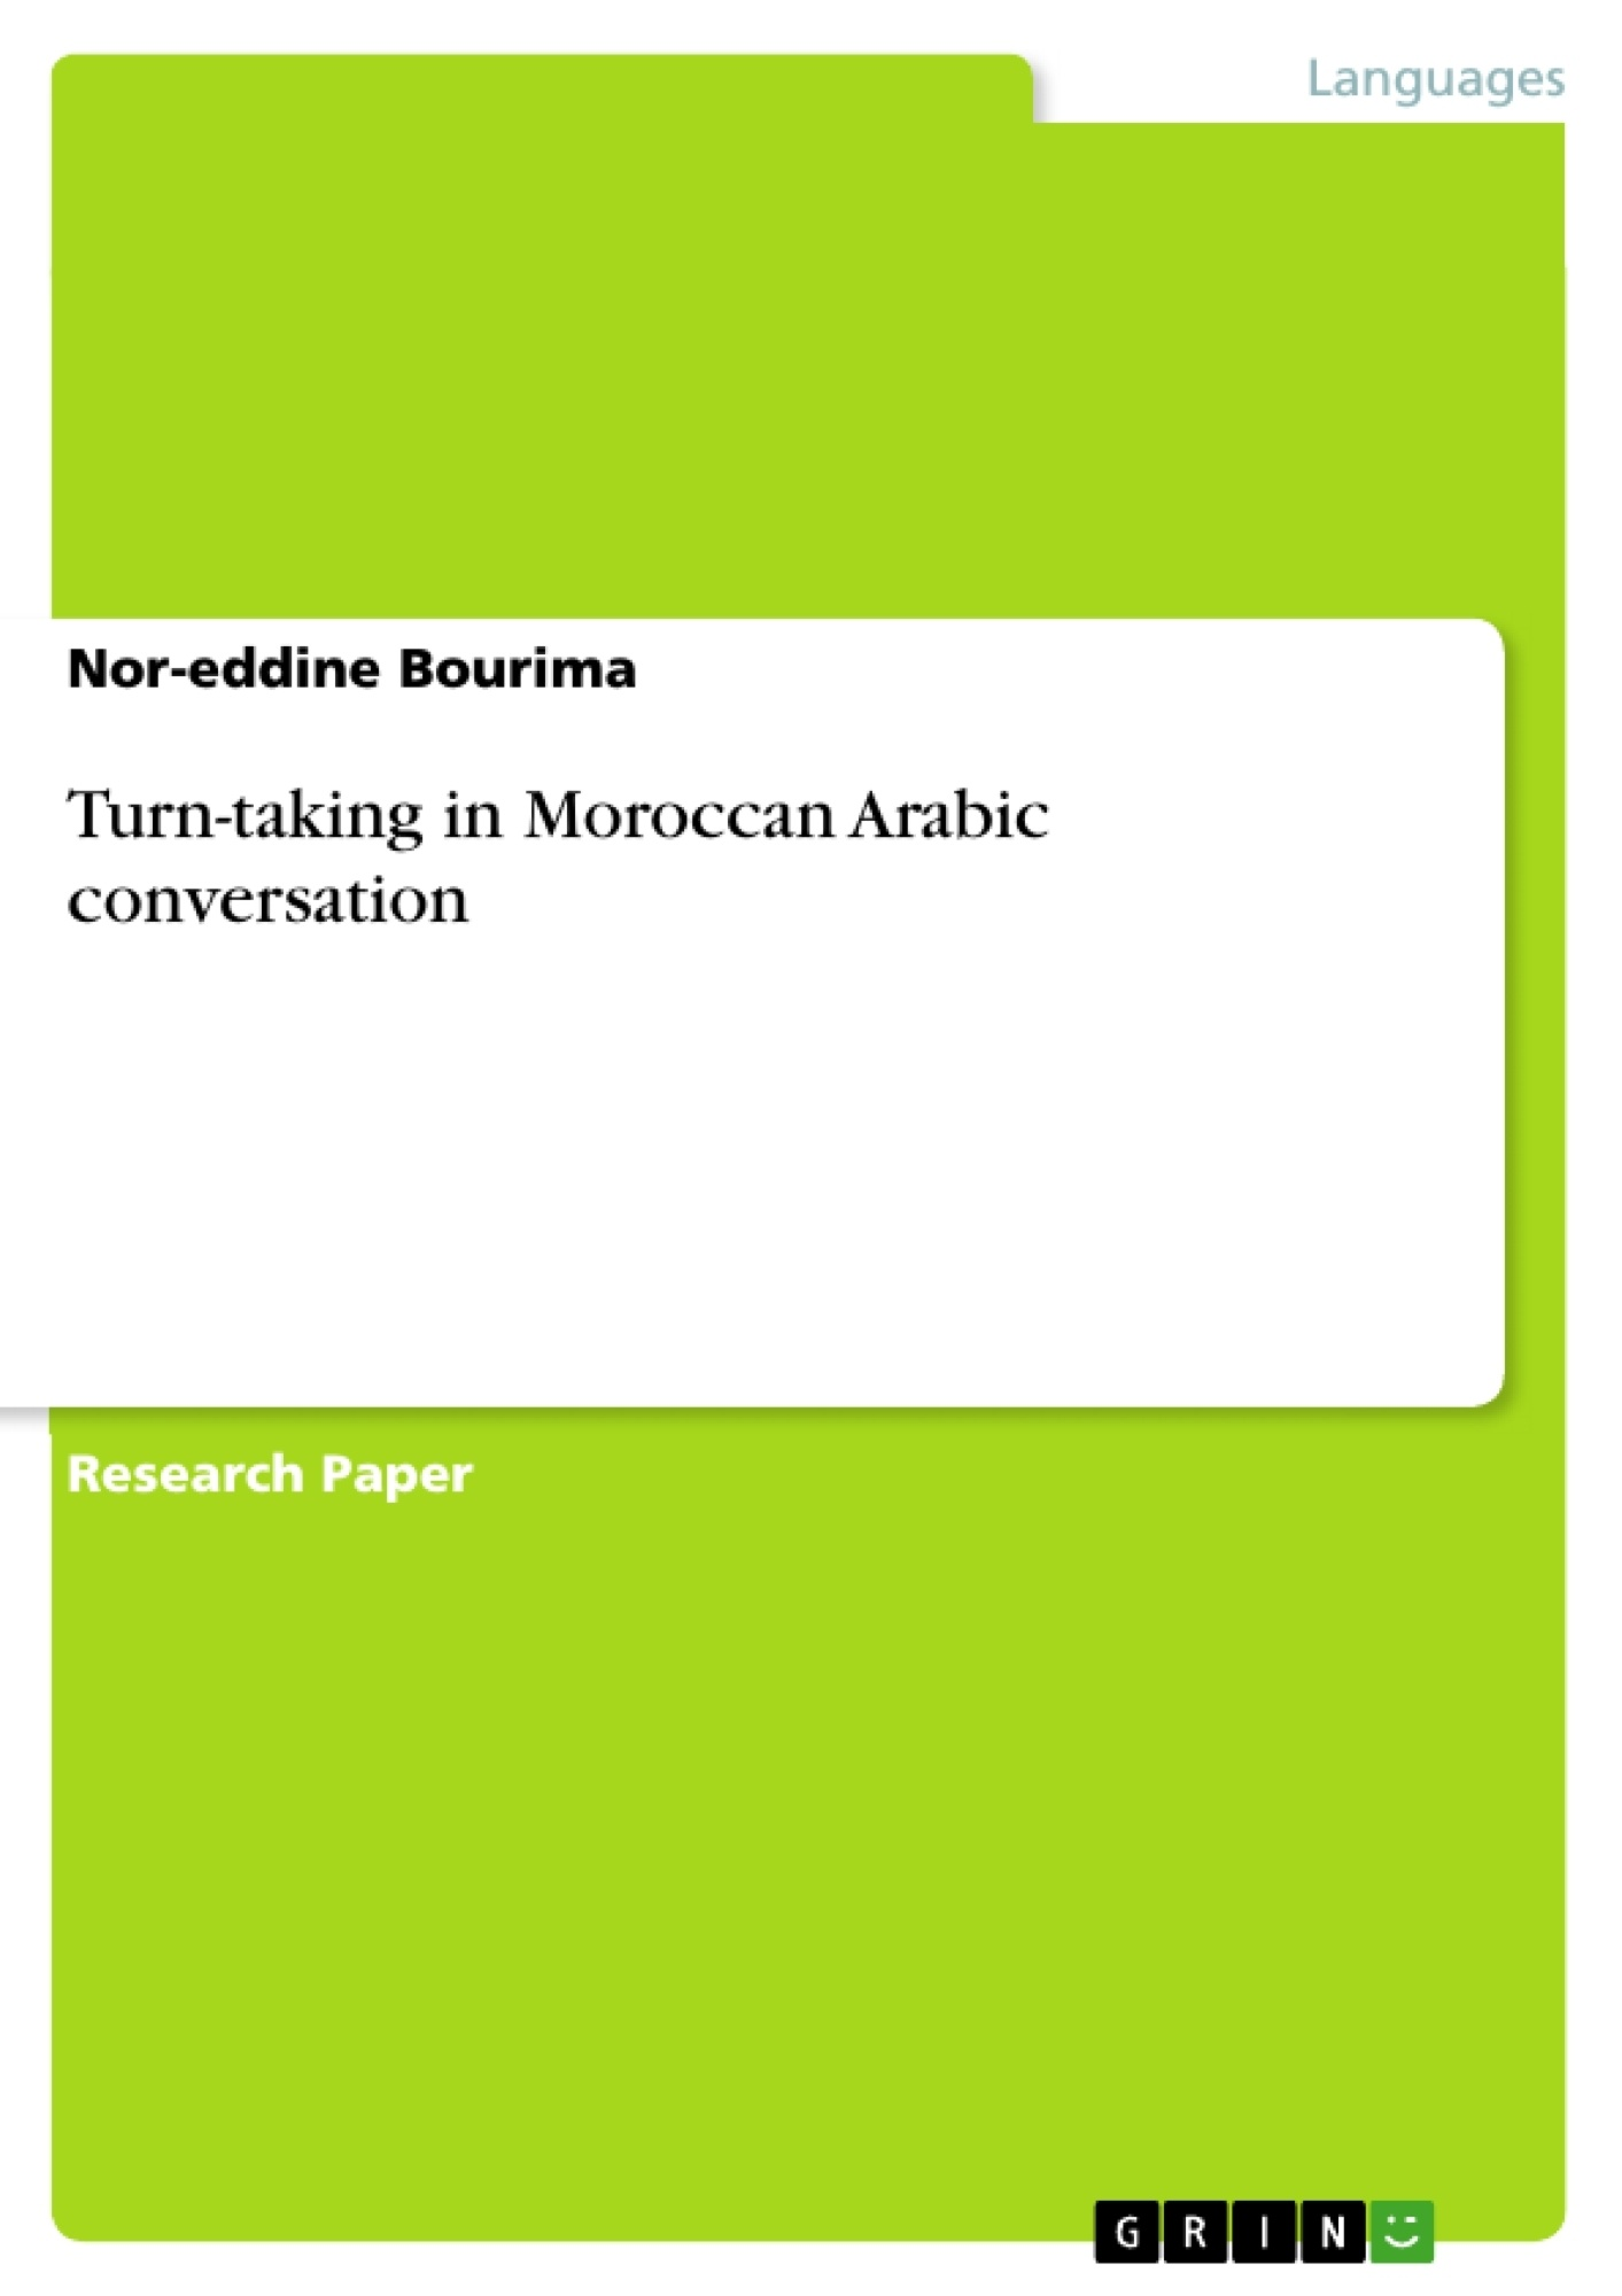 Title: Turn-taking in Moroccan Arabic conversation